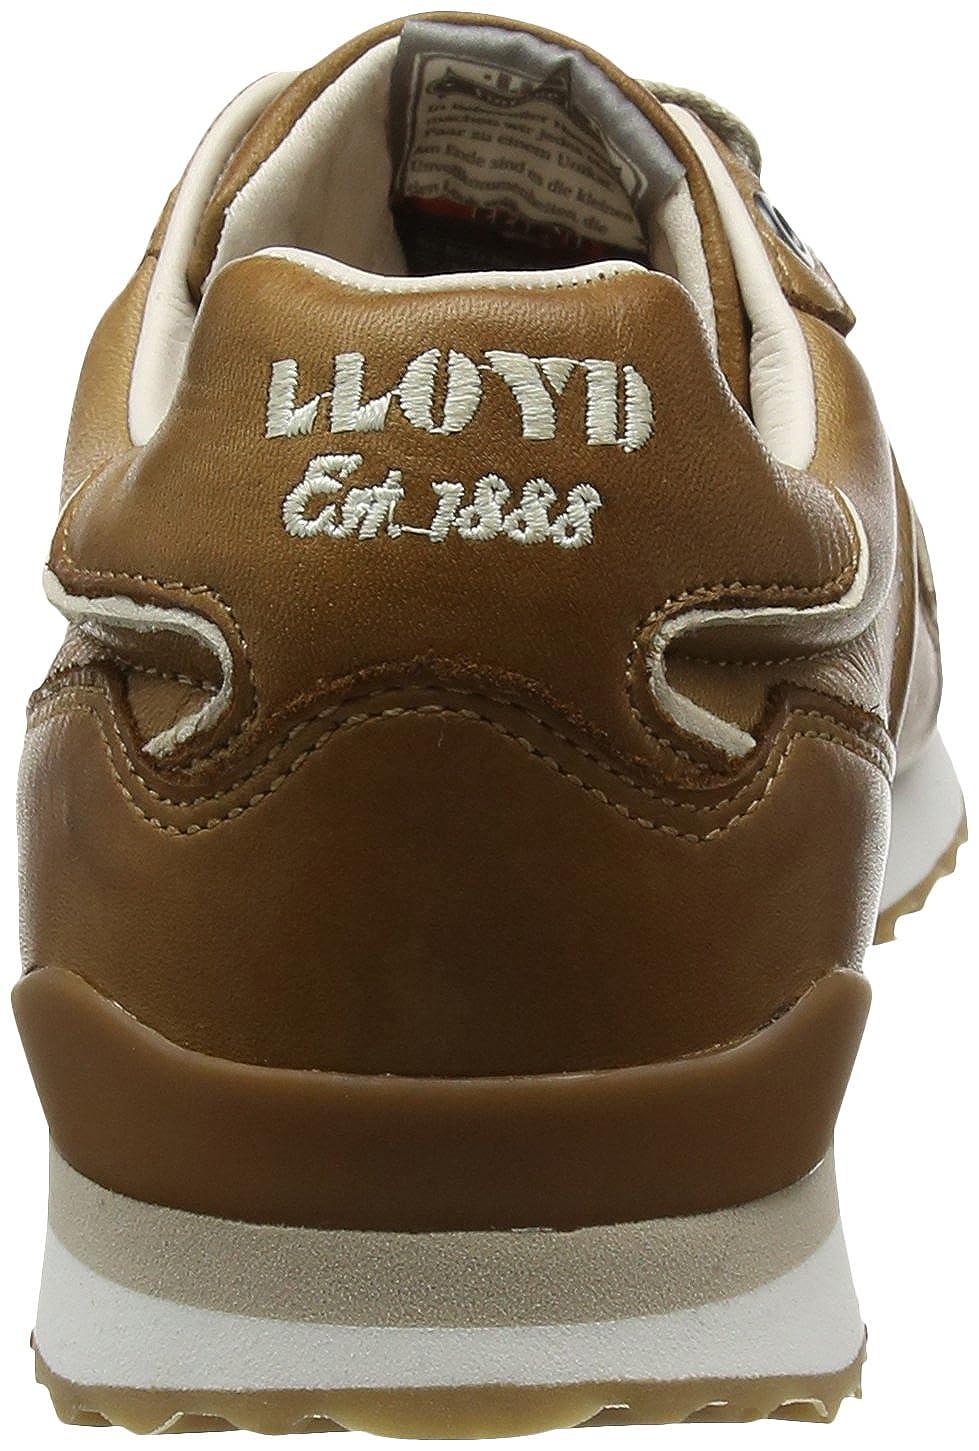 LLOYD Herrenschuh Herrenschuh Herrenschuh EDICO, sportiver Turnschuhe aus Leder mit heller Gummisohle 1ee3f5